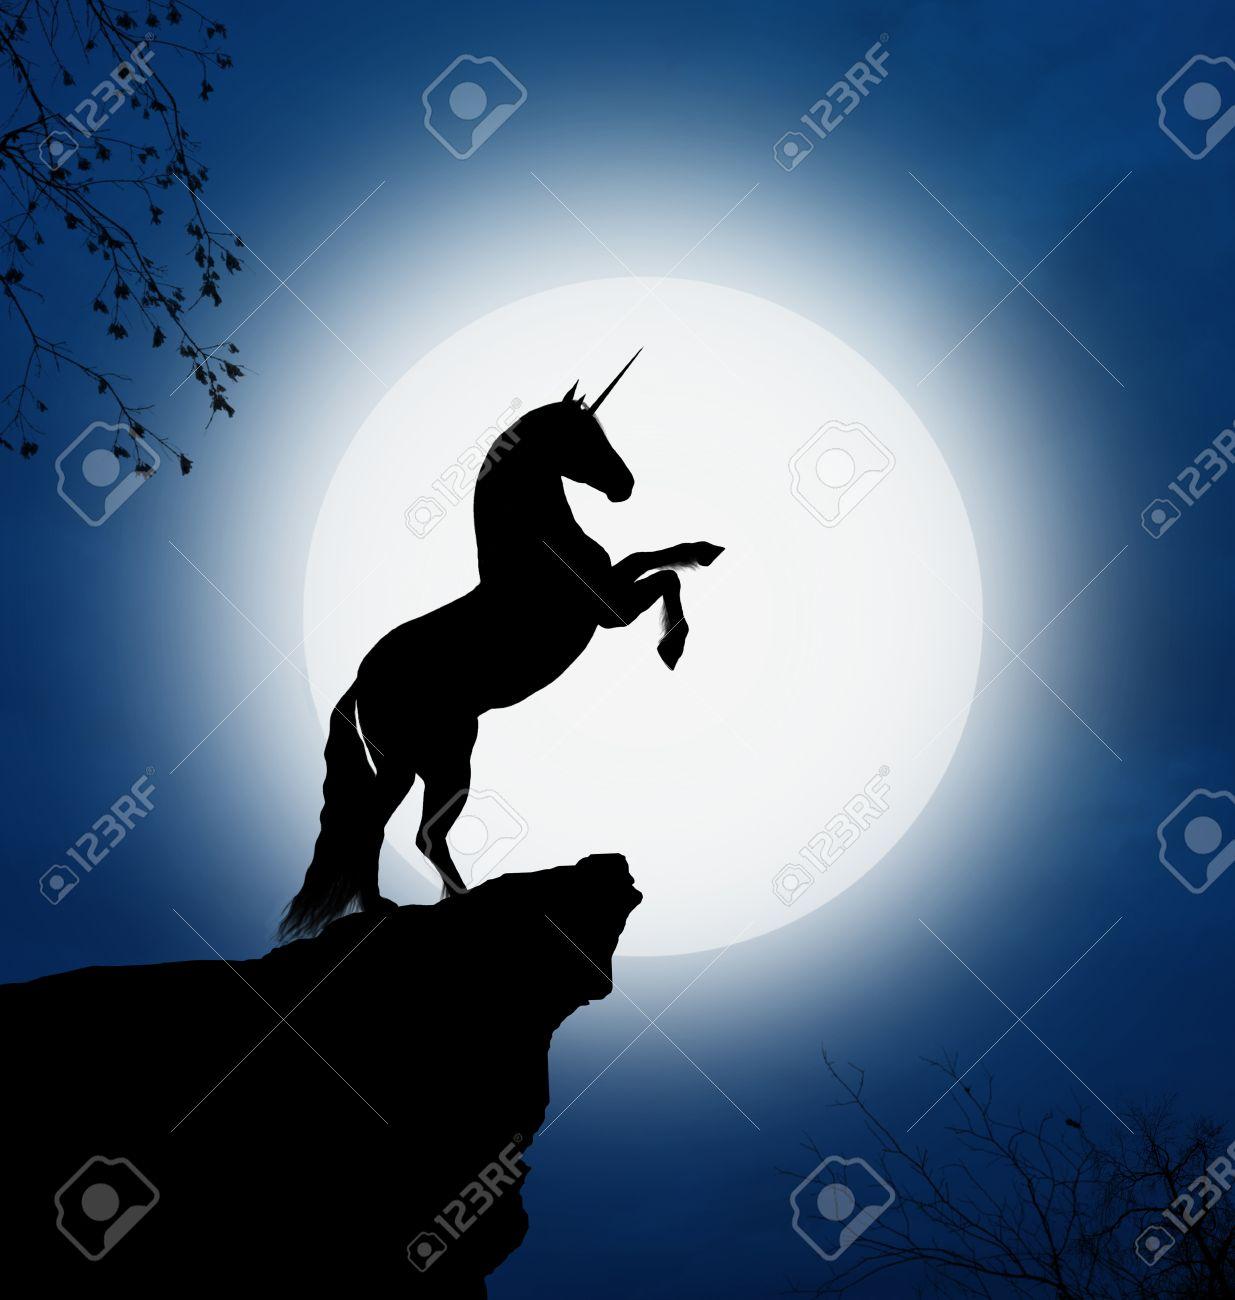 Fantastic unicorn in a full moon night - 29235334